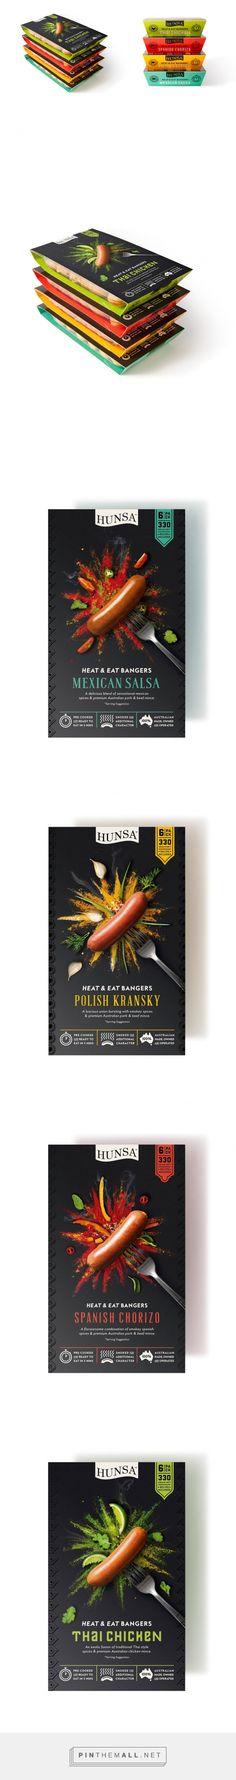 Hunsa Heat & Eat Bangers packaging designed by Dessein - http://www.packagingoftheworld.com/2016/01/hunsa-heat-eat-bangers.html